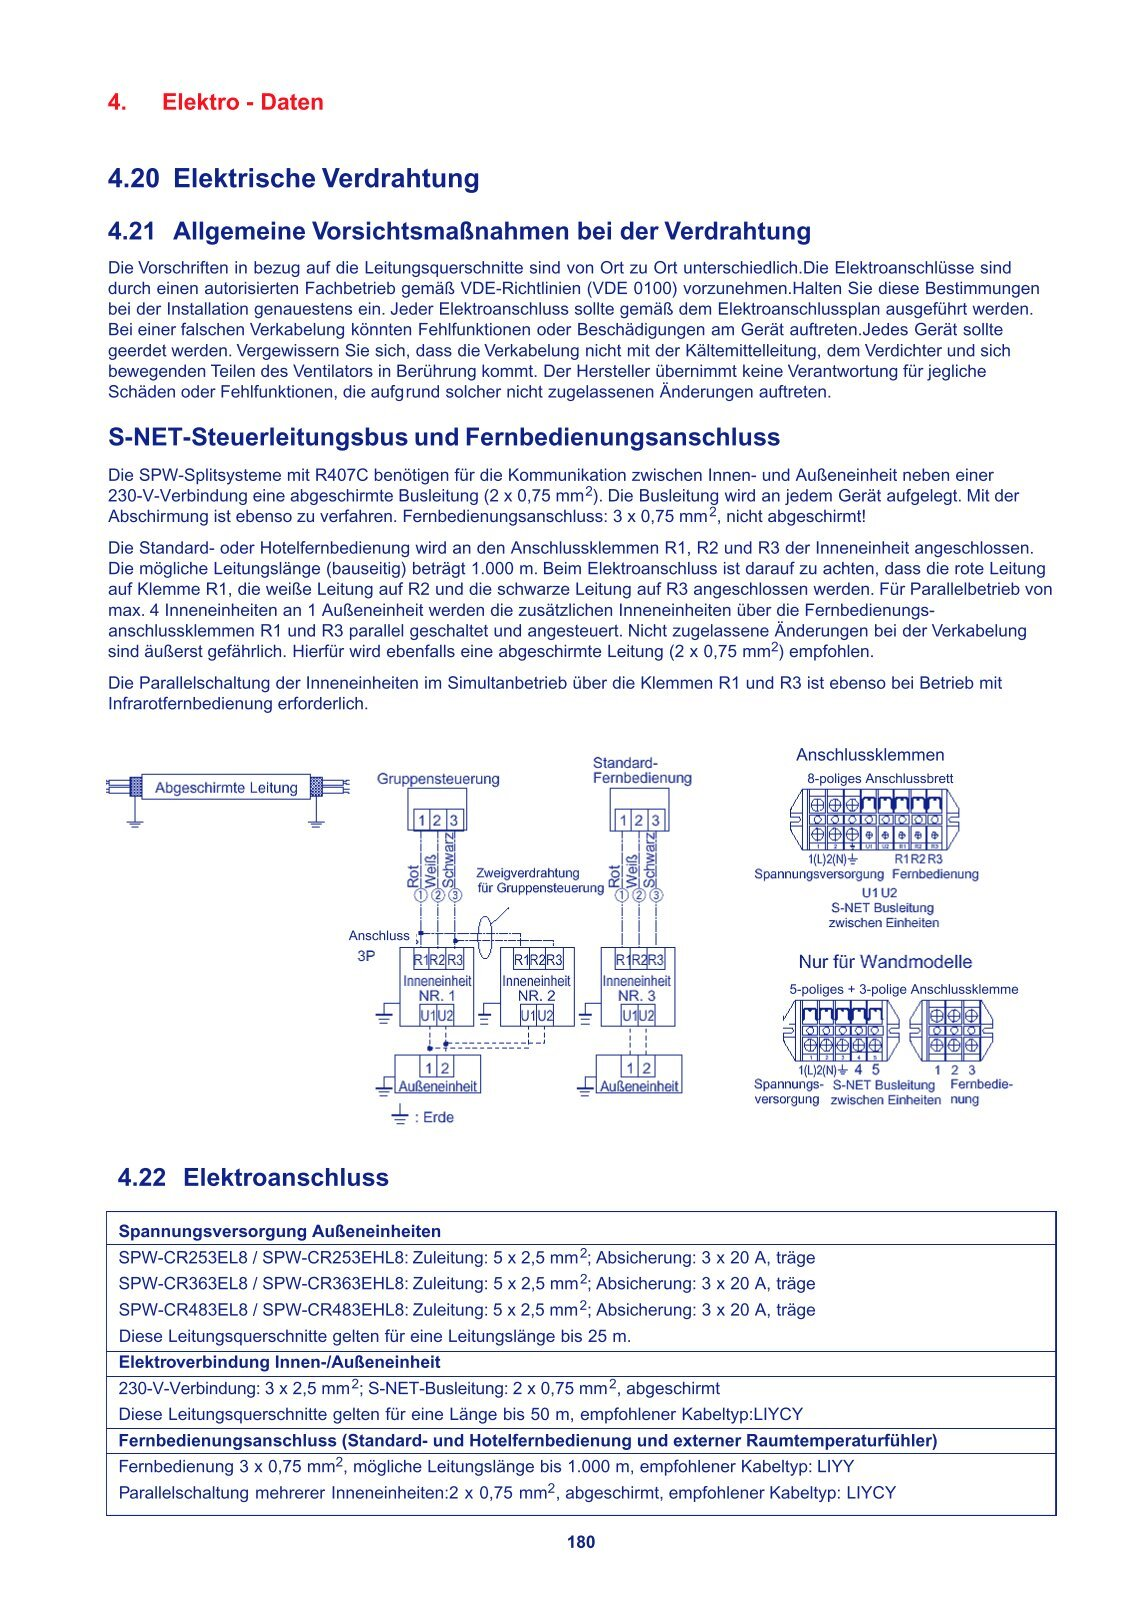 Berühmt 3 Draht Trockneranschluss Bilder - Die Besten Elektrischen ...